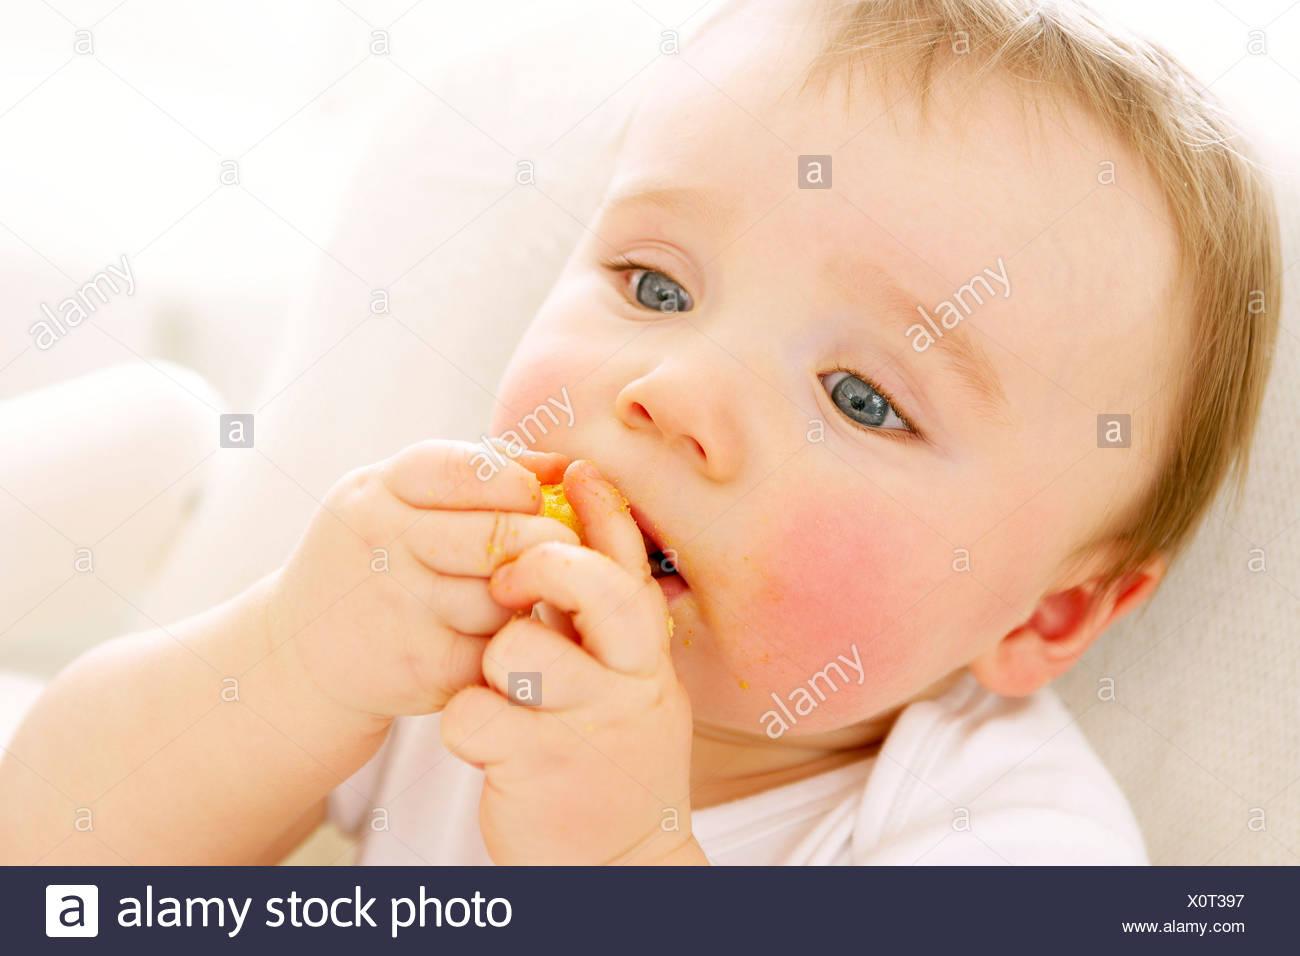 Baby boy eating a crisp - Stock Image